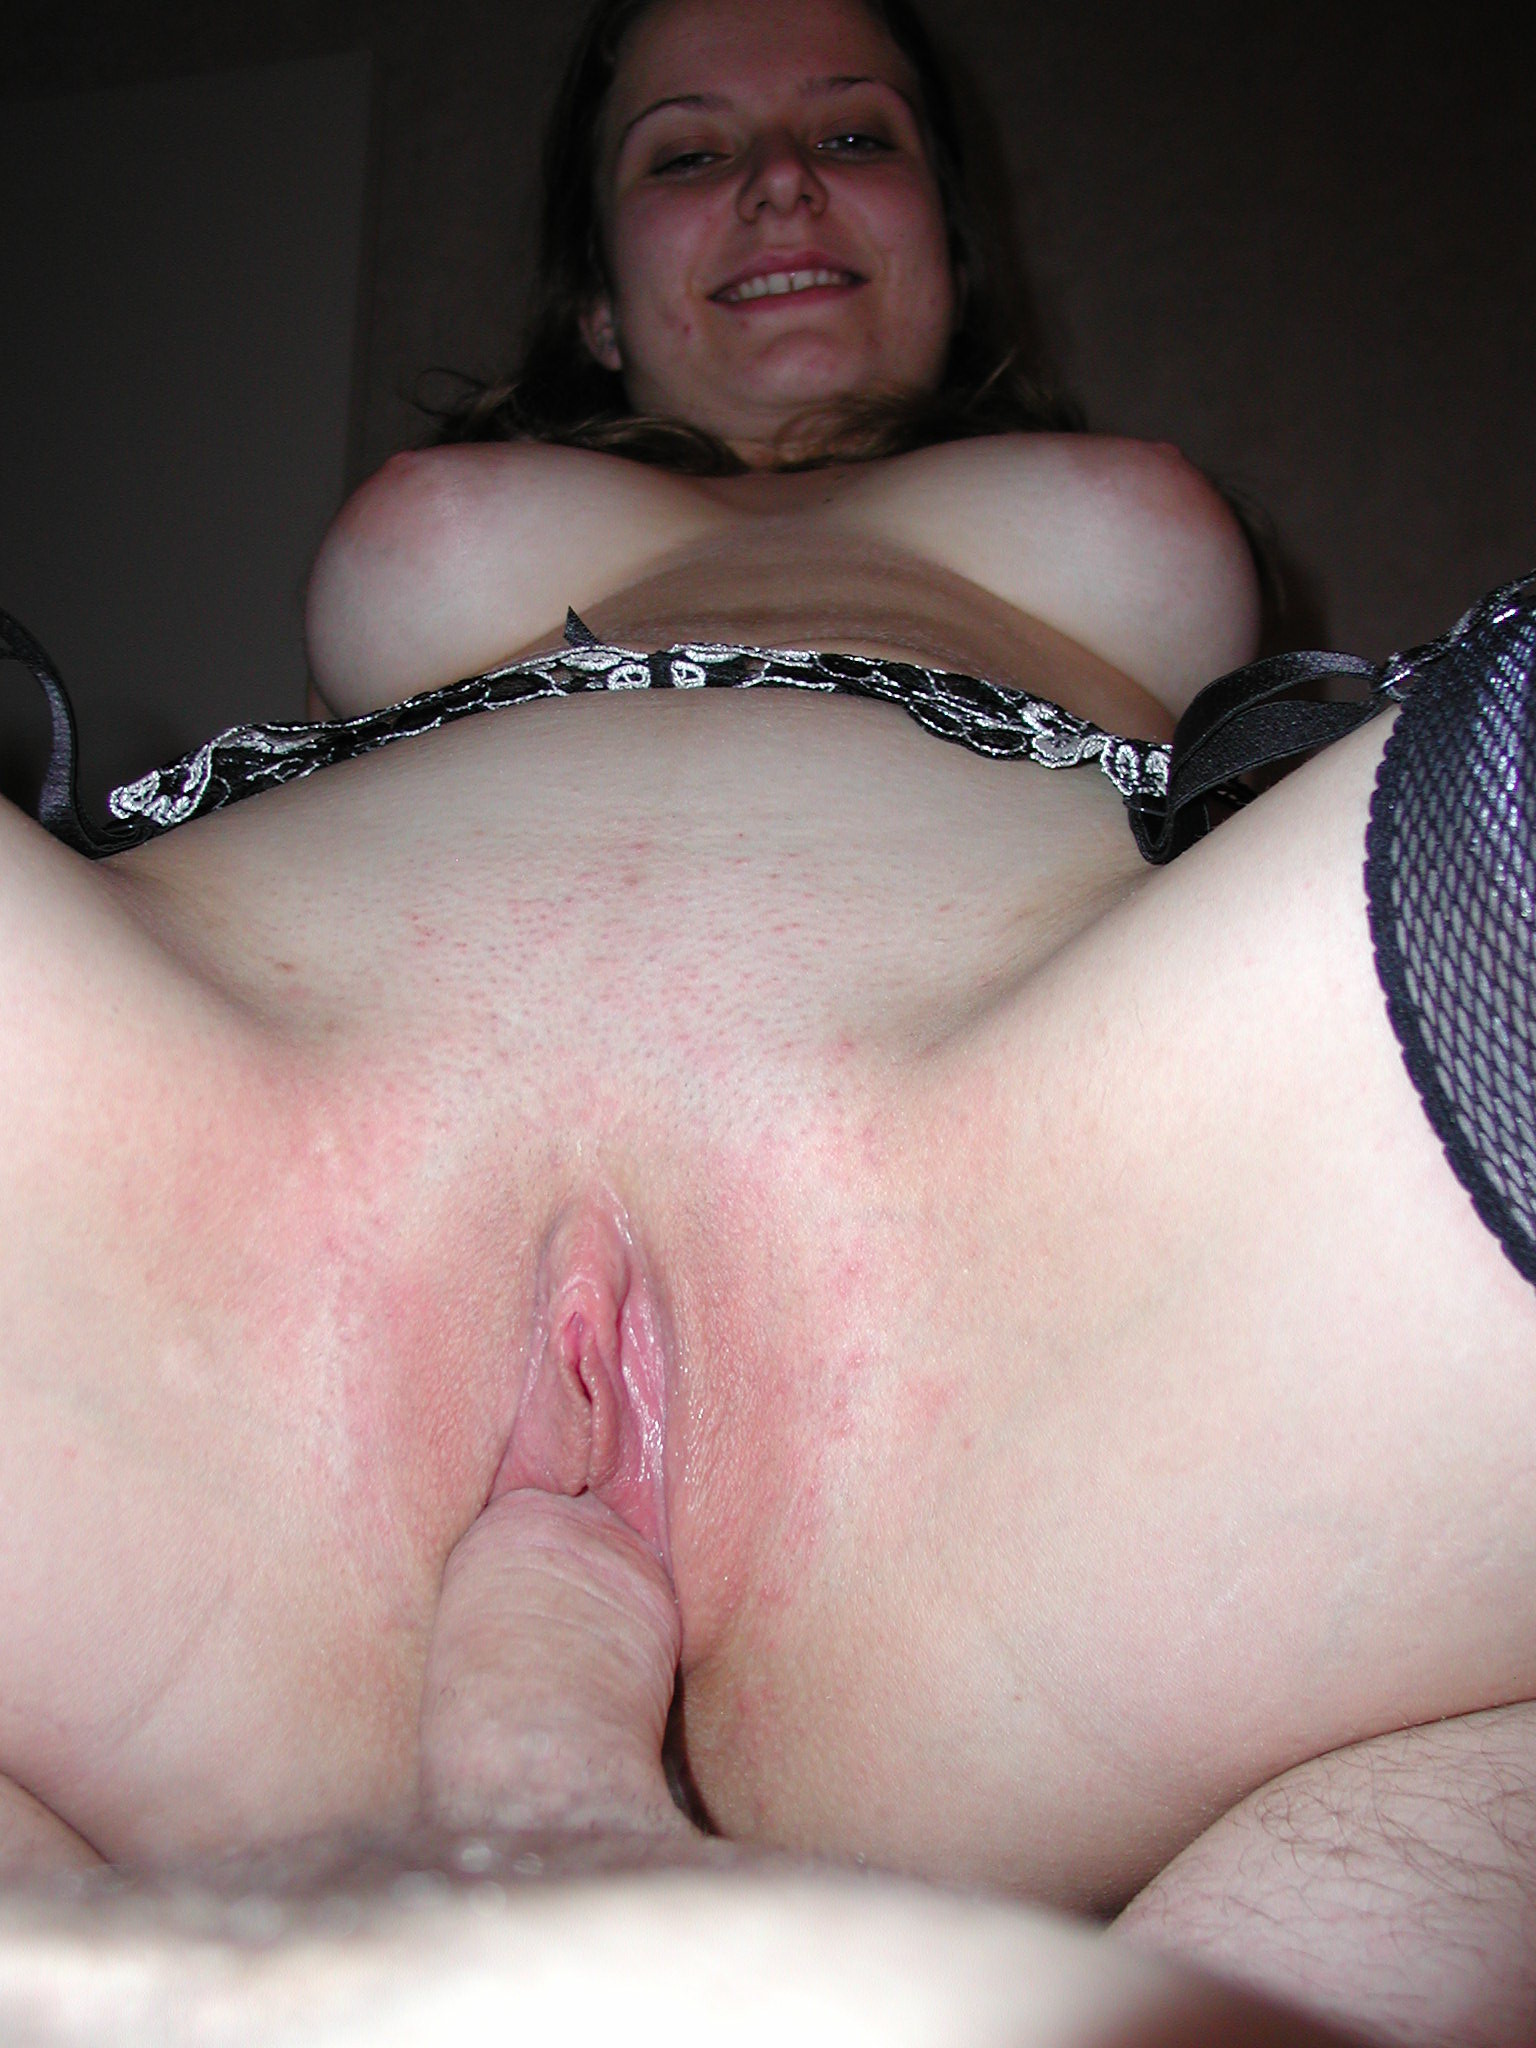 Просто фото домашнего секса - компиляция 27